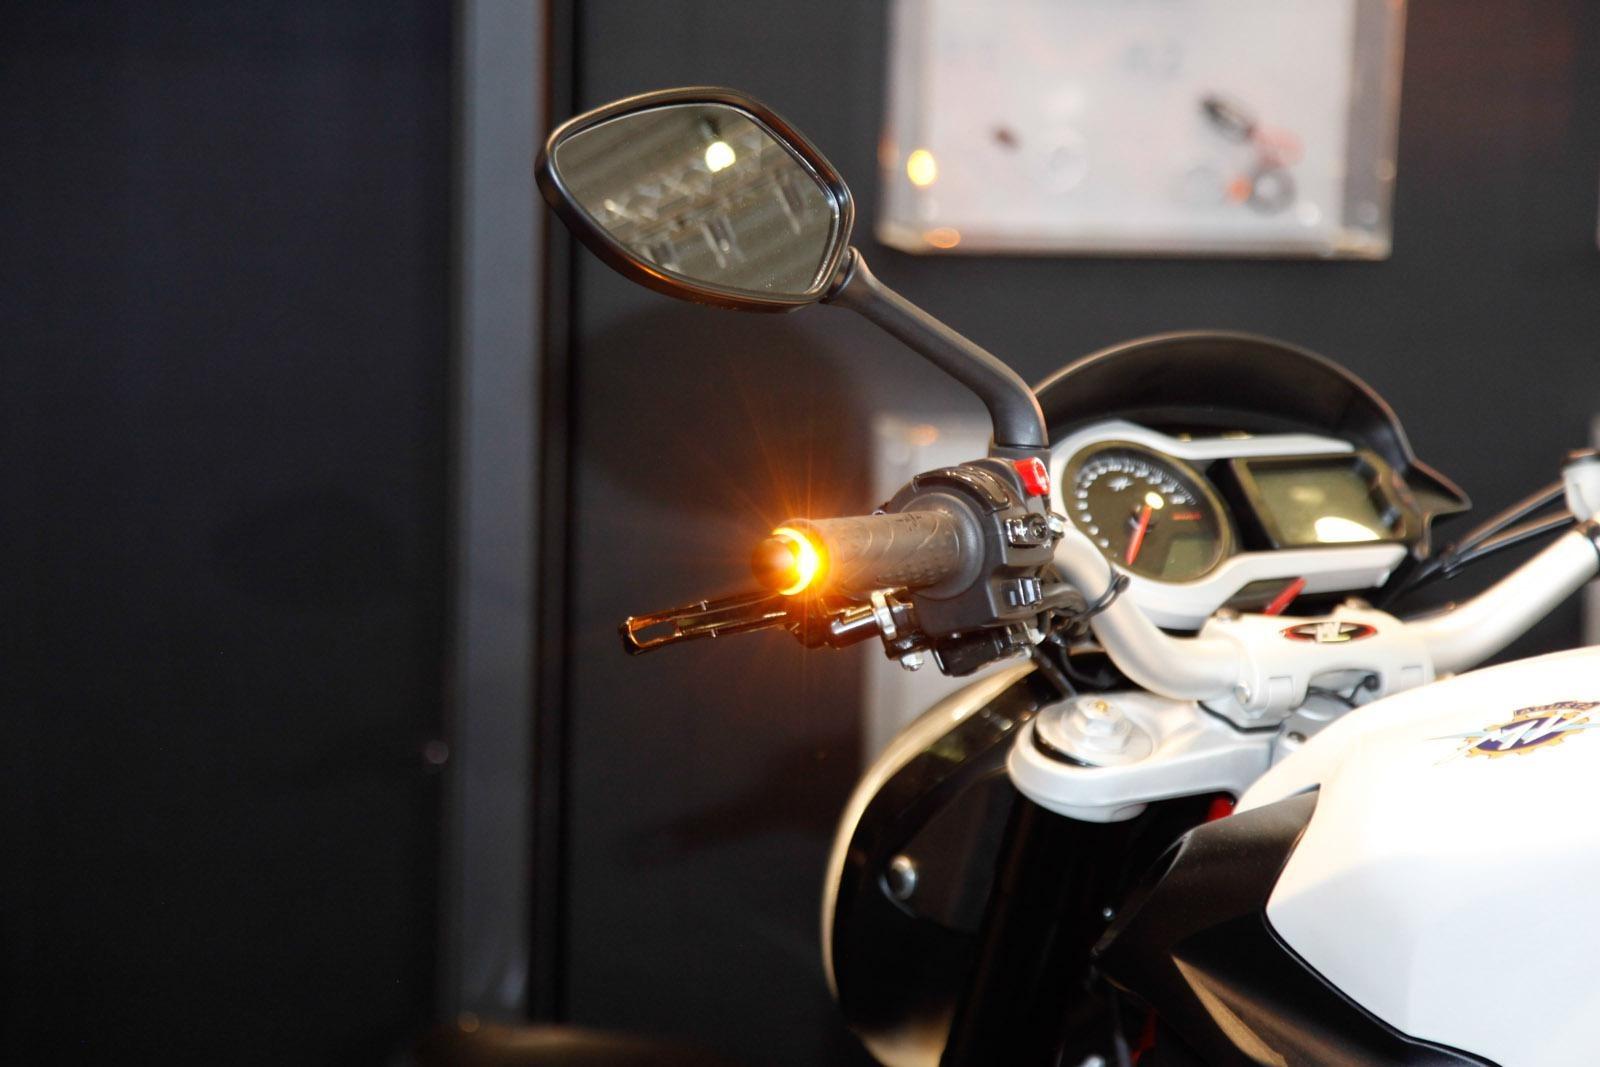 Lenkerblinker Motorrad Kellermann BL 2000 Dark mit getöntem Glas ECE-geprüft